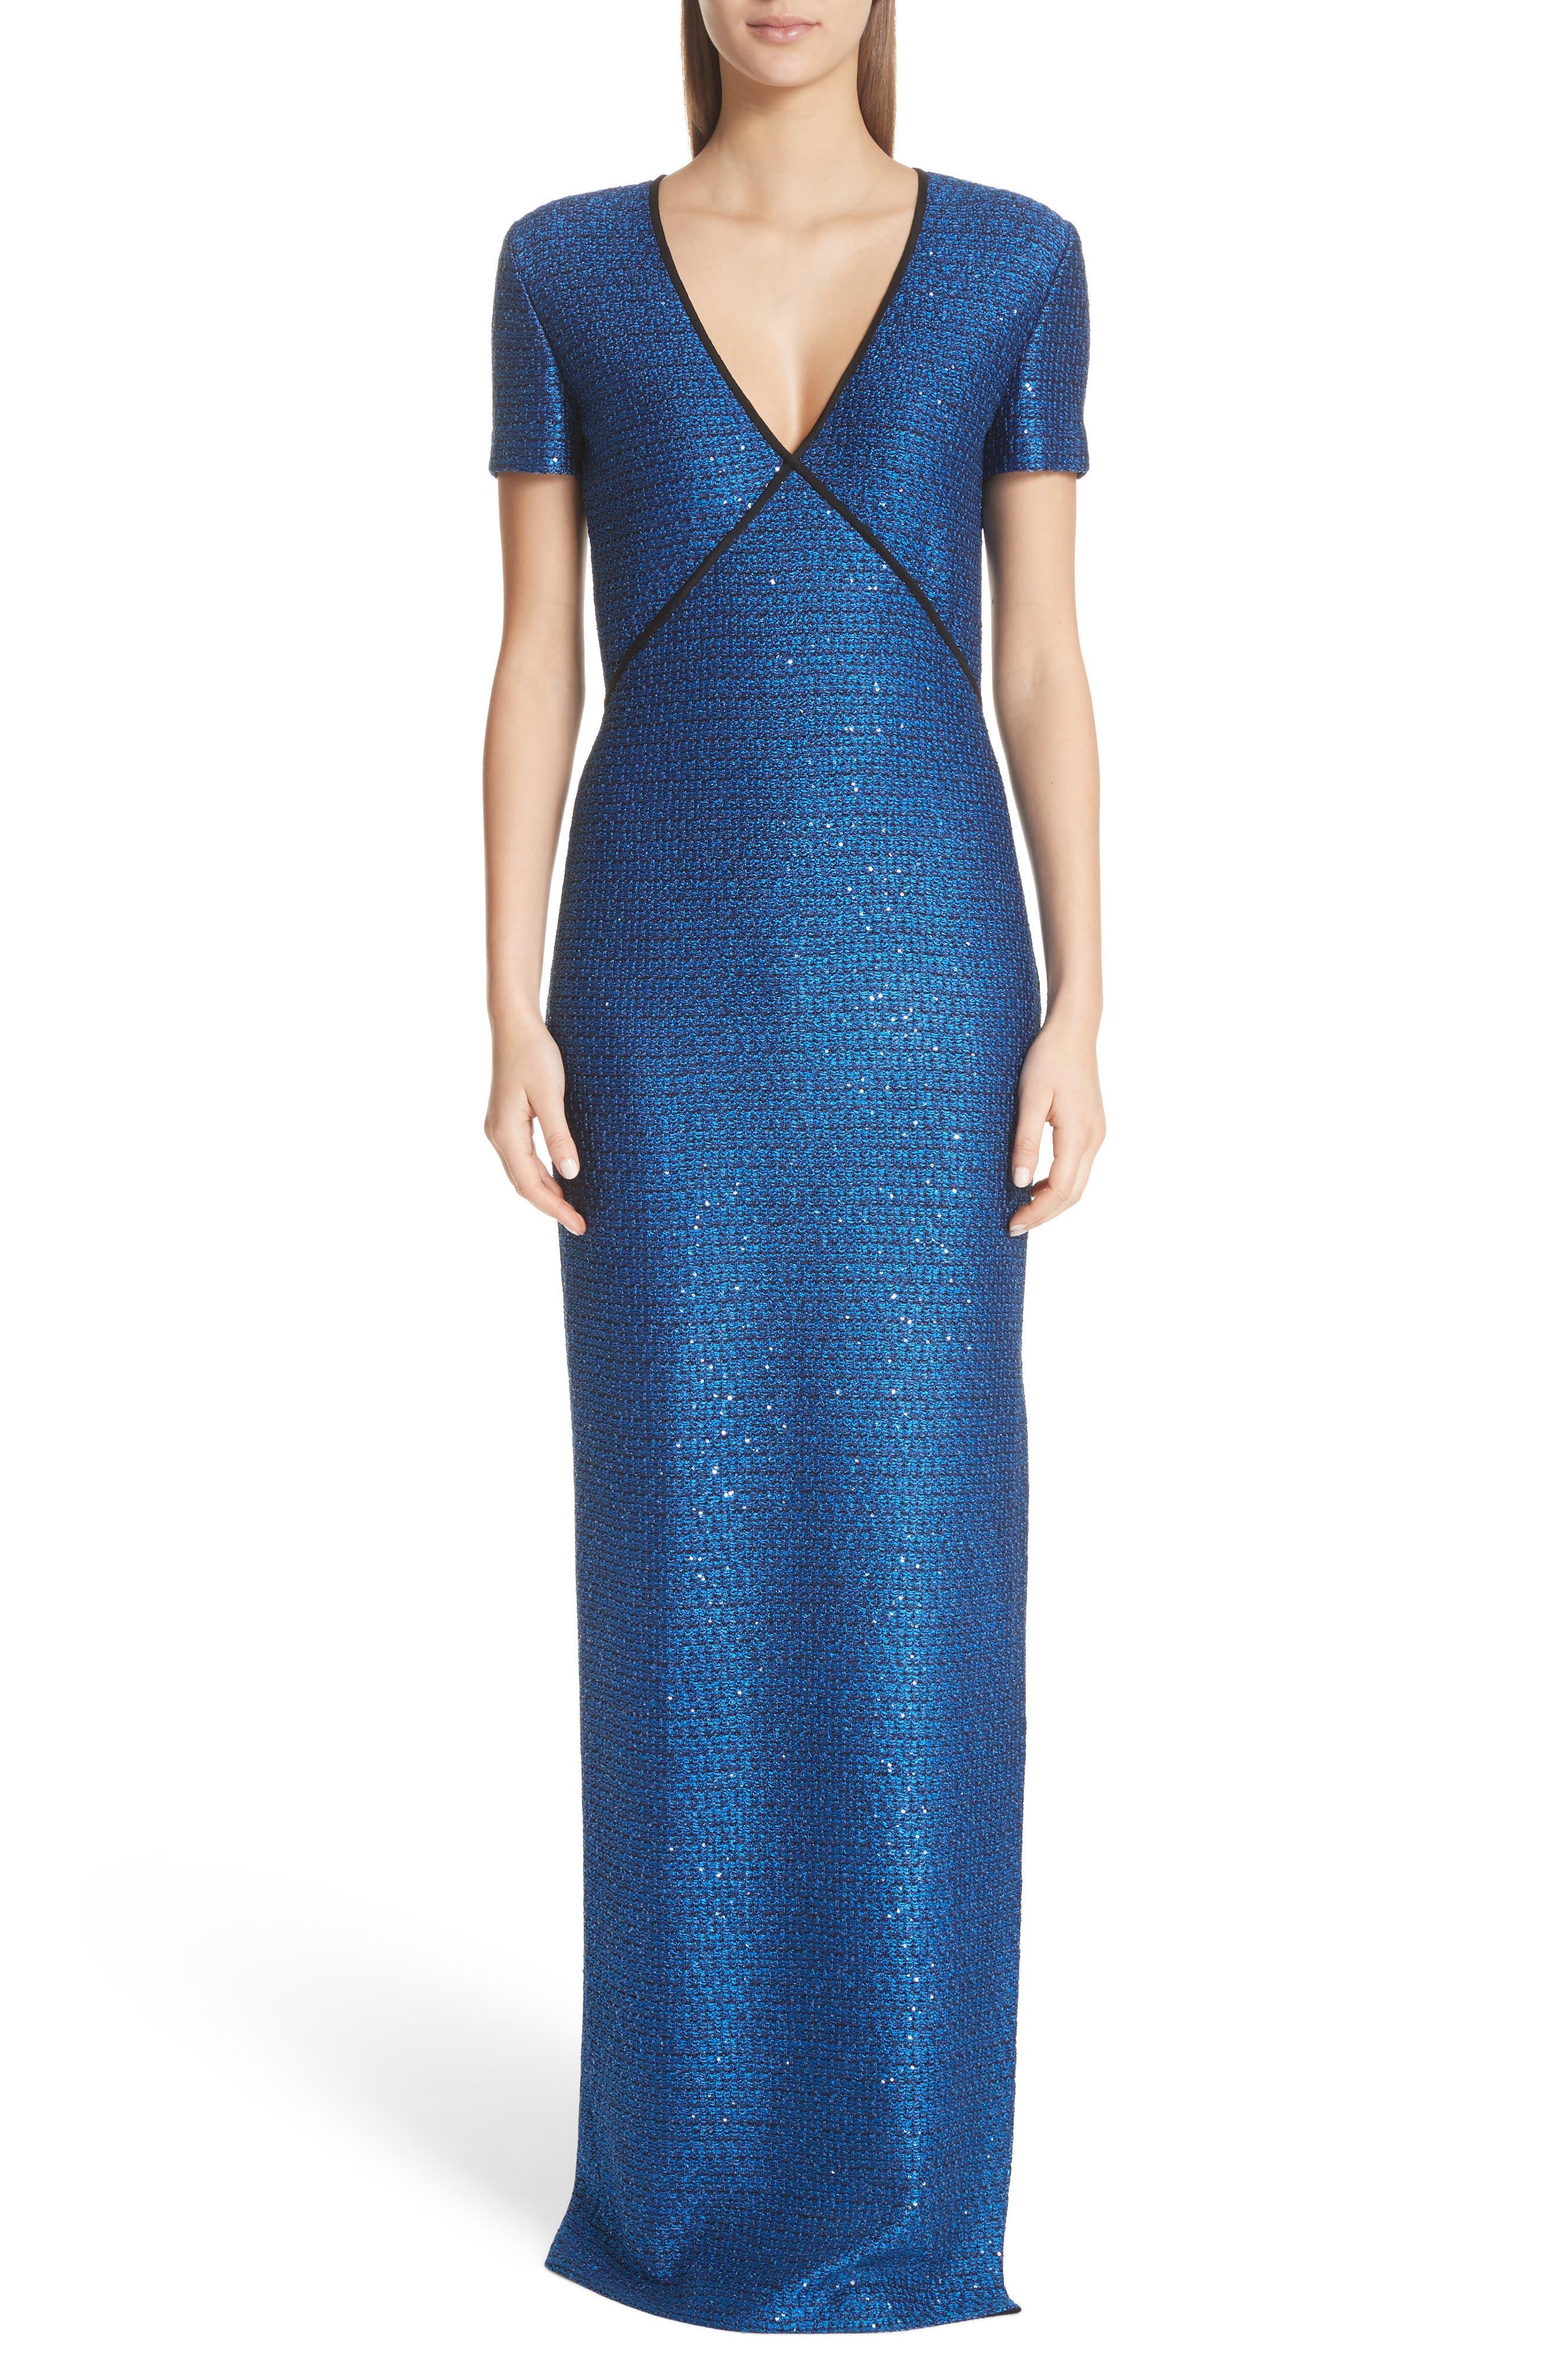 St. John Evening Luster Sequin Gown